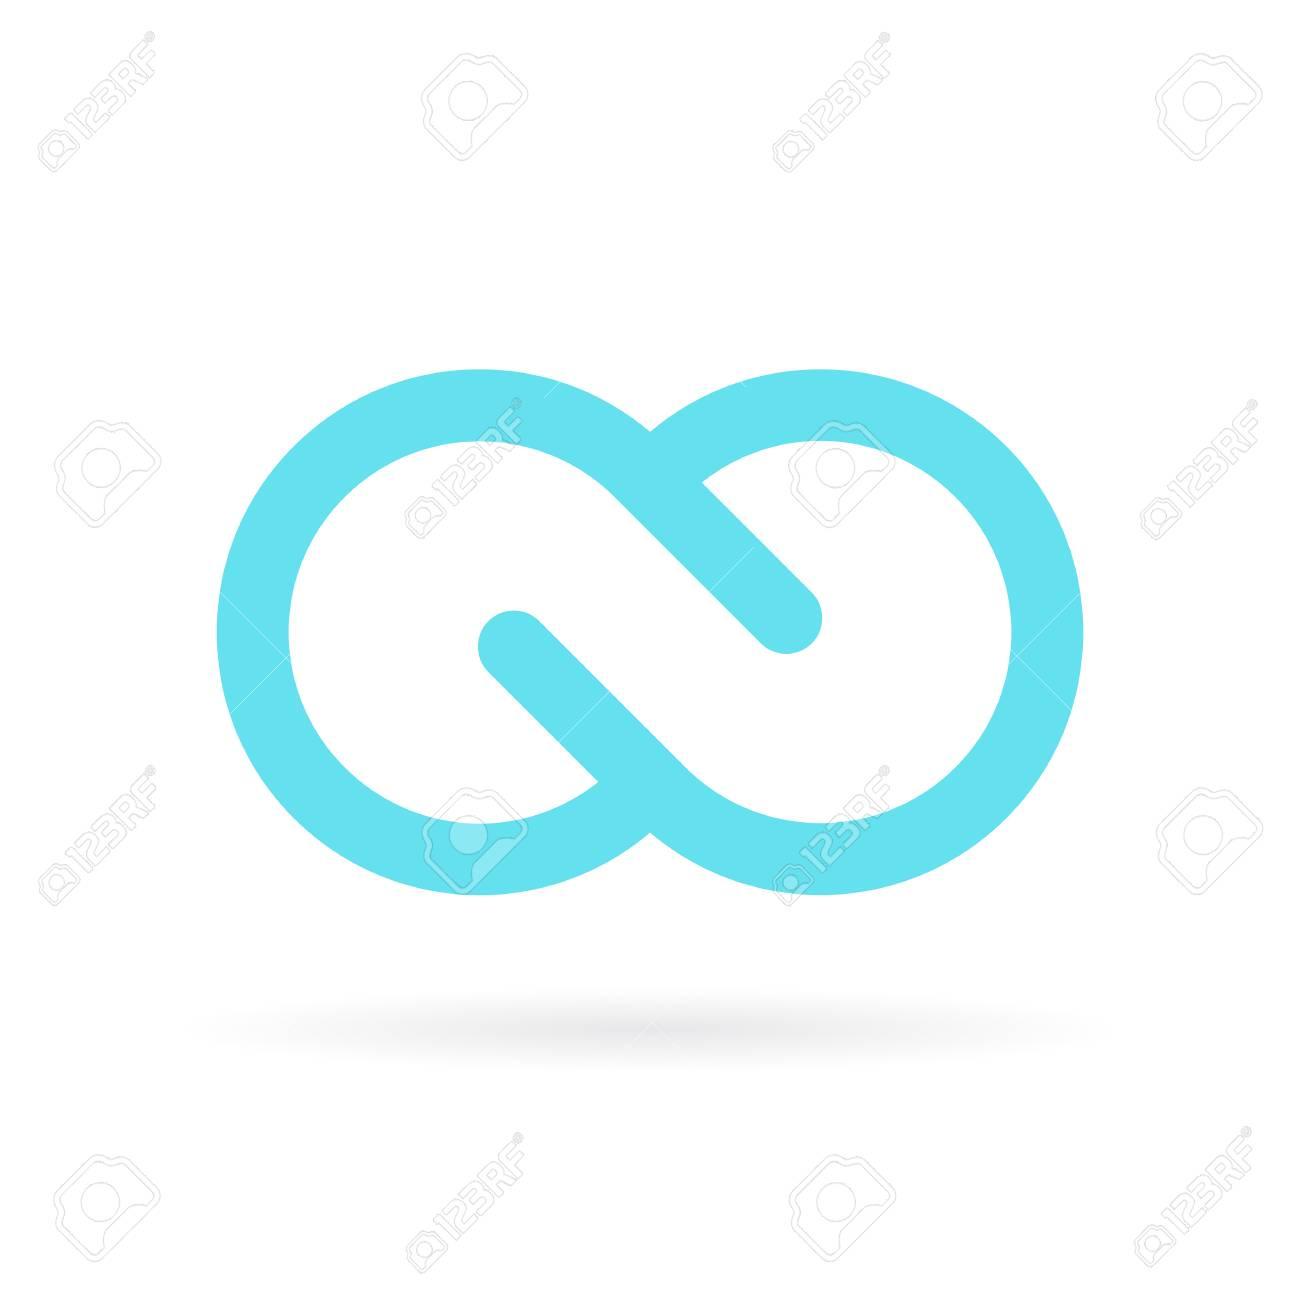 Blue Infinite Vector Symbol Royalty Free Cliparts Vectors And